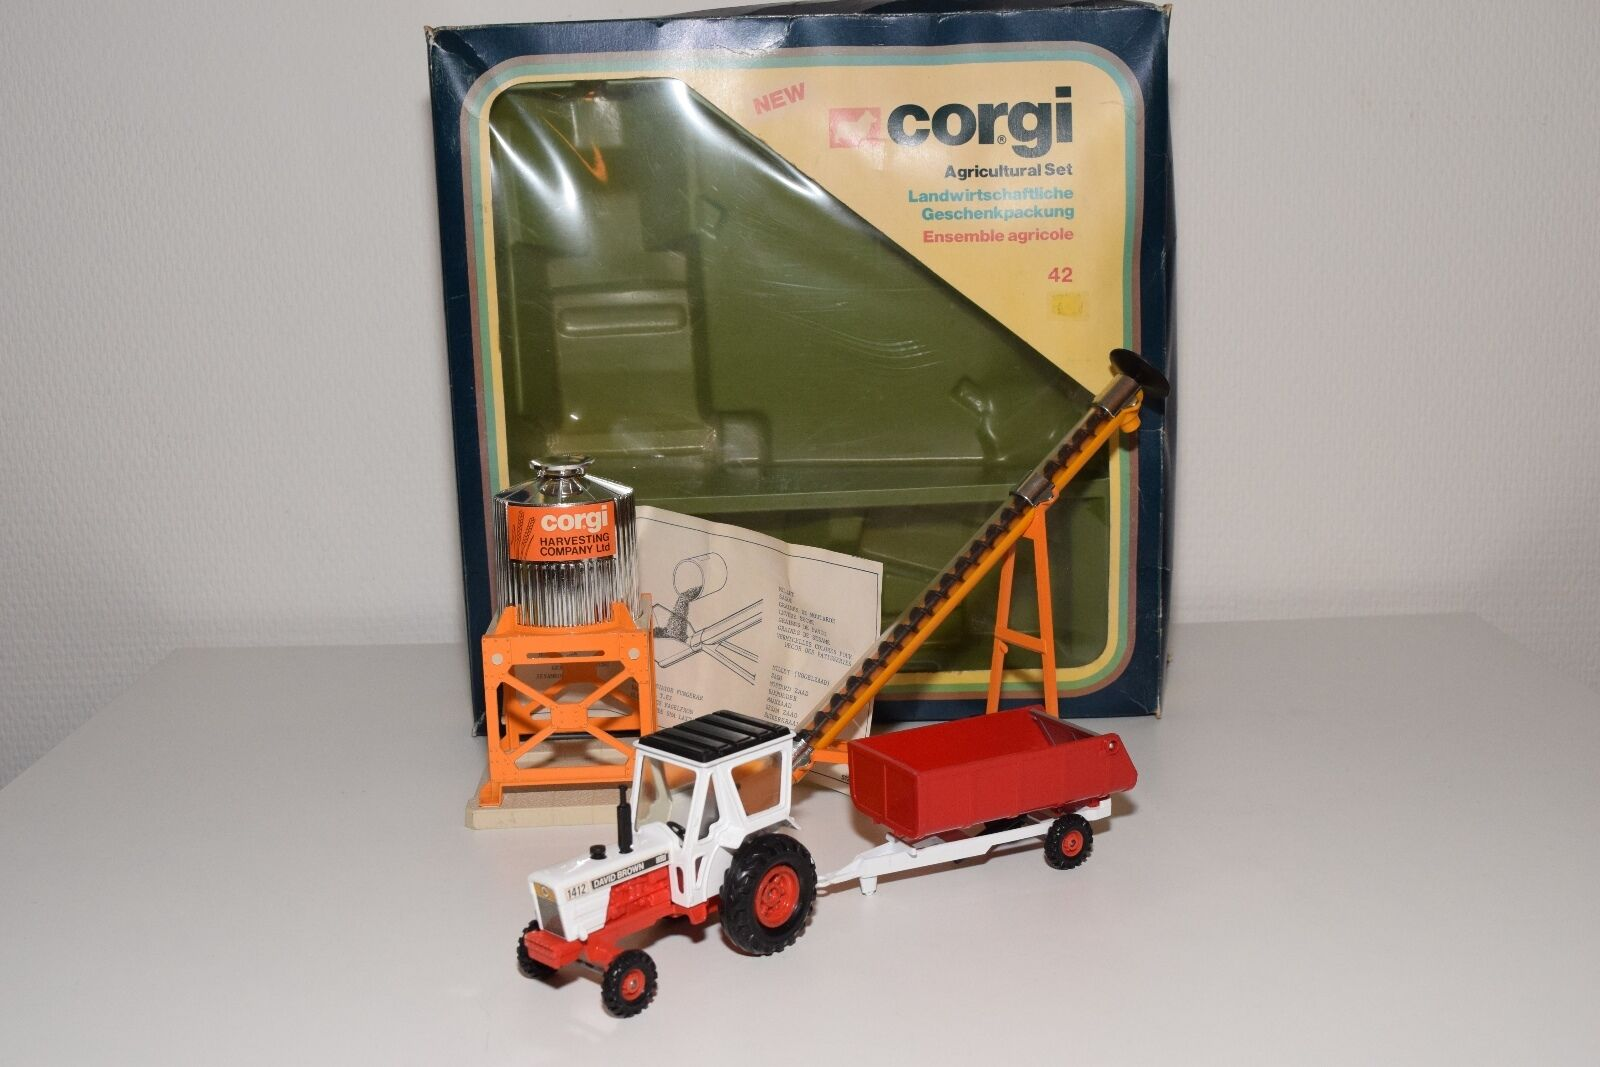 \\ CORGI TOYS GIFTSET GIFT SET 42 AGRICULTURAL NEAR MINT BOXED RARE SELTEN RARO